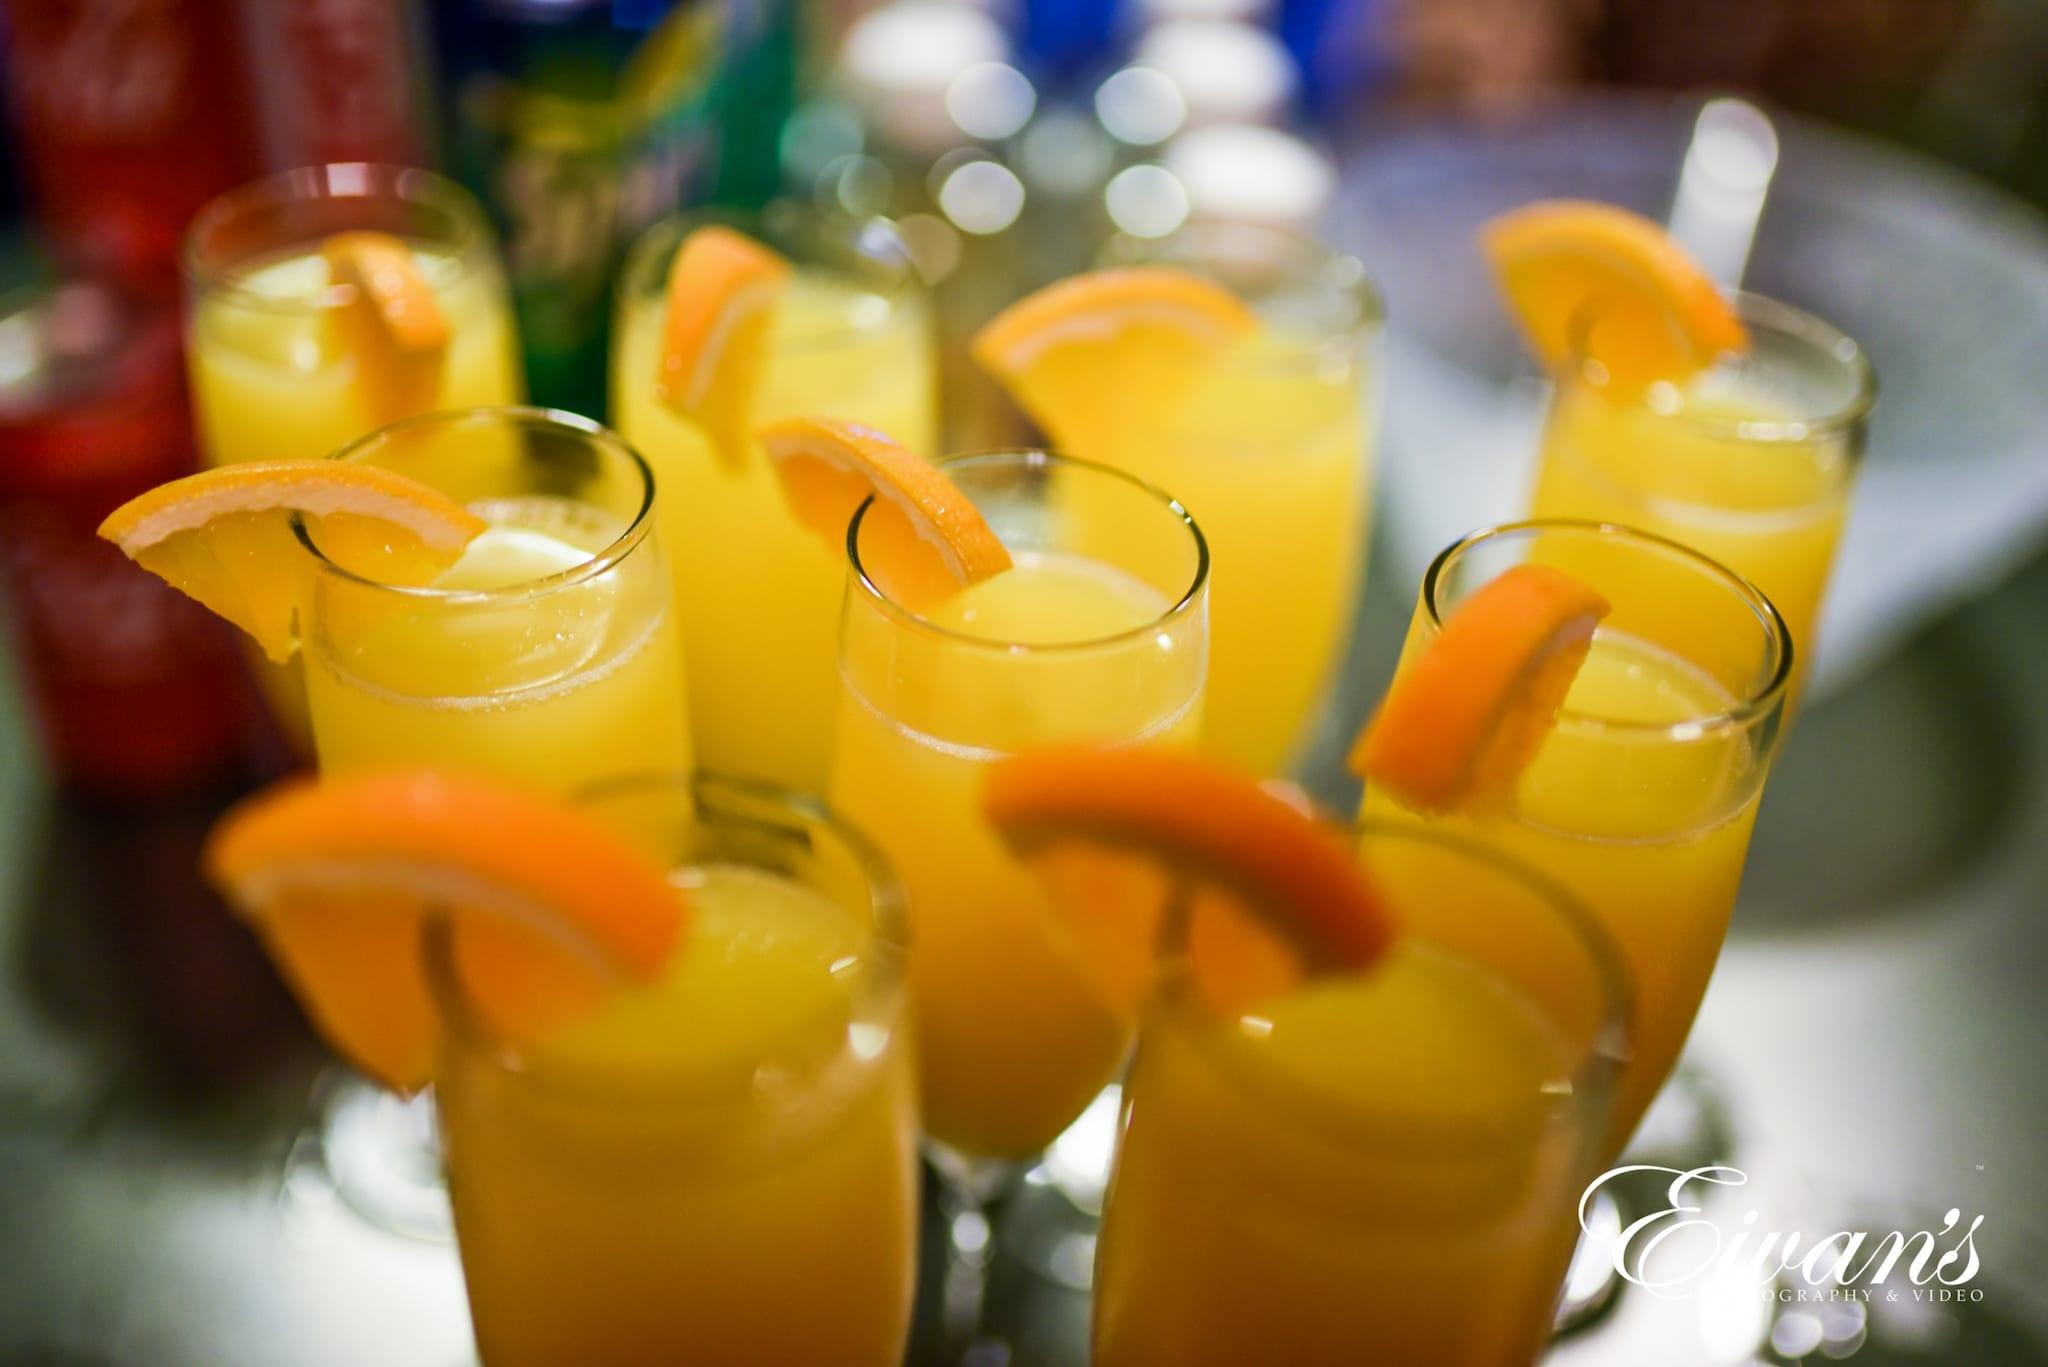 image of glasses of orange juice